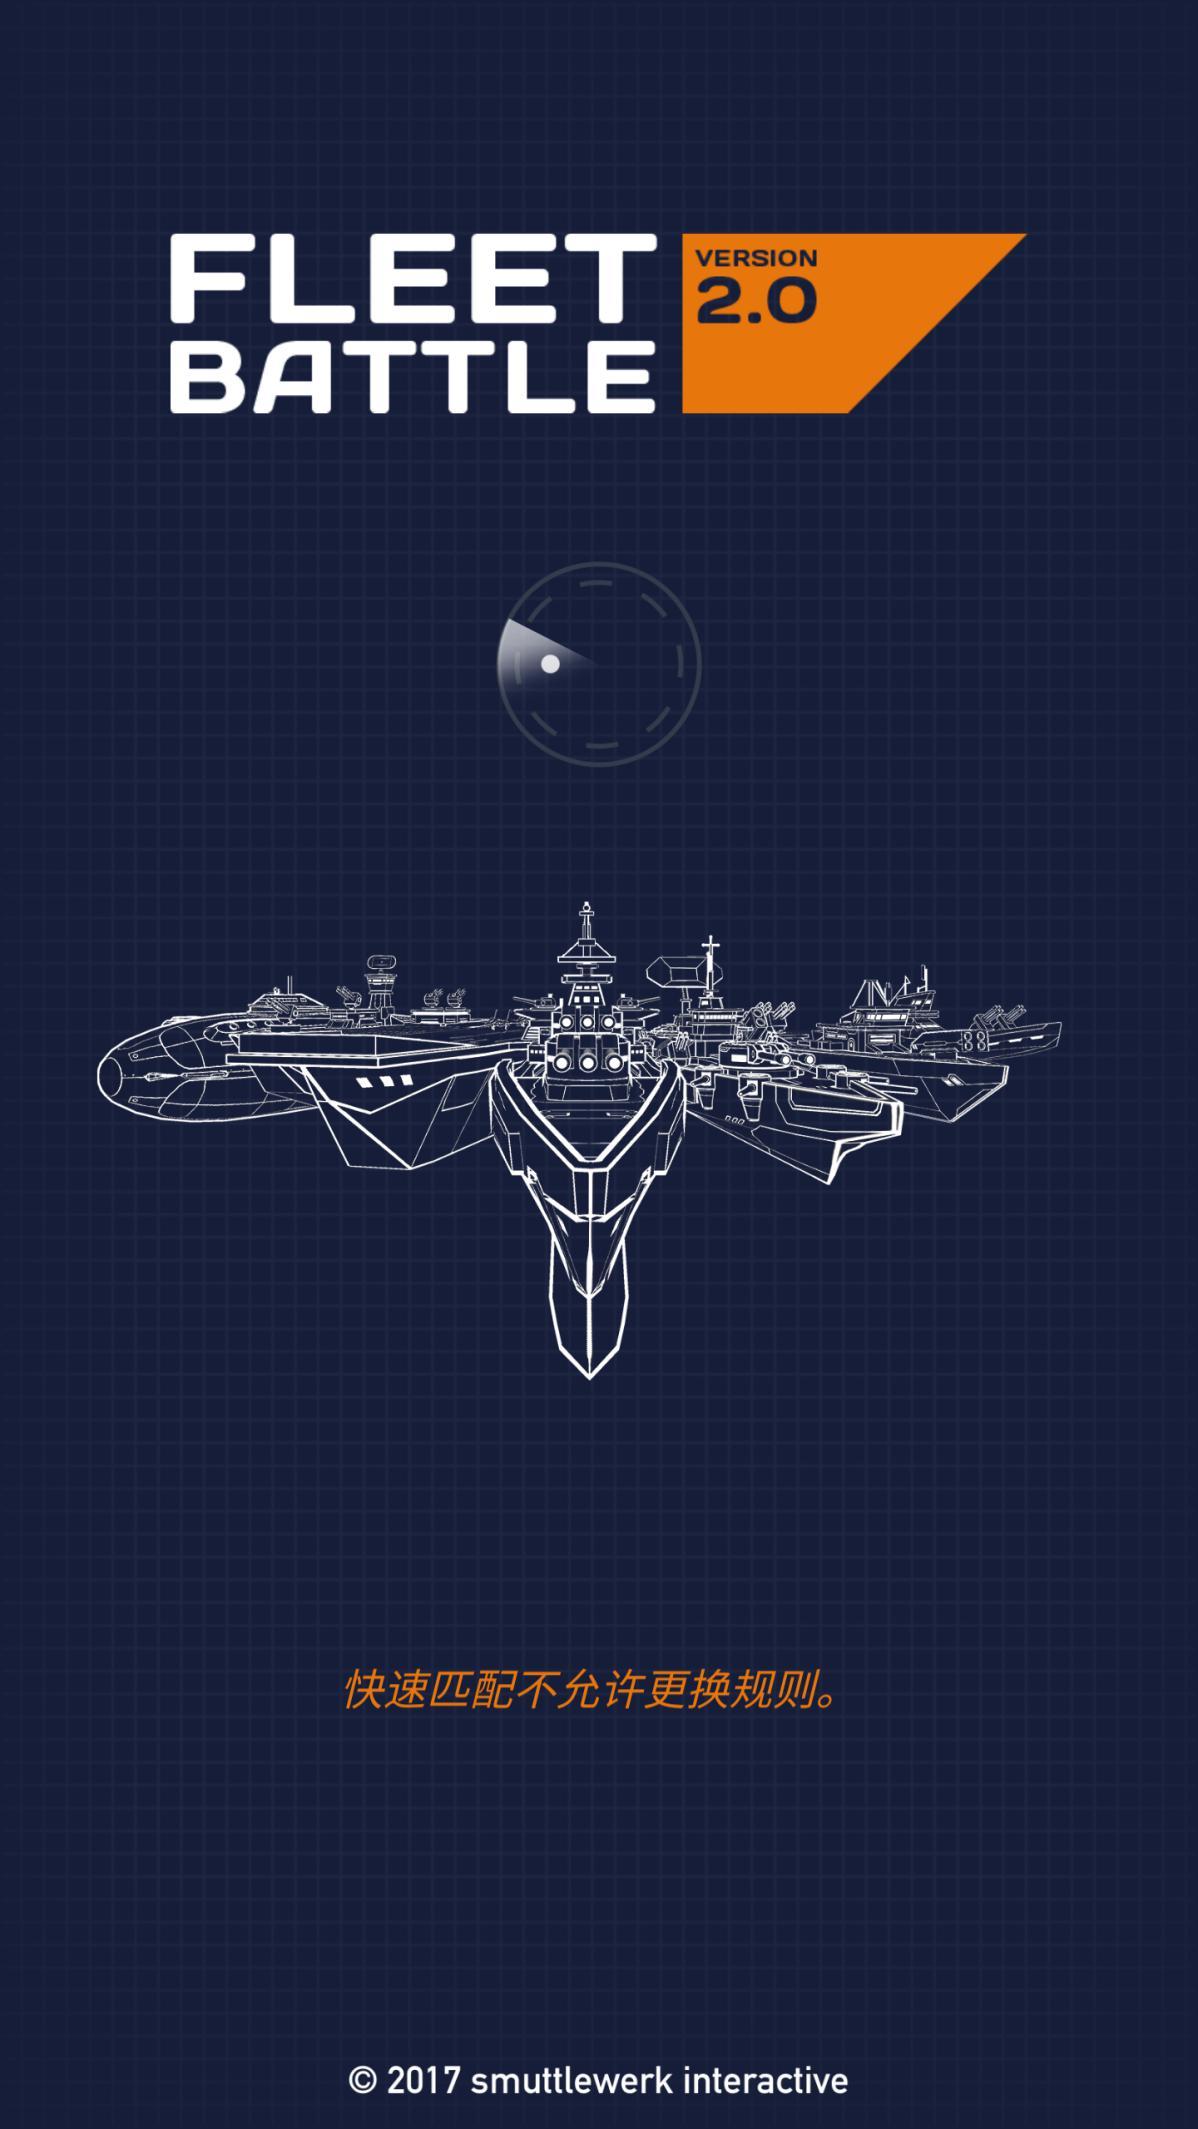 Fleet Battle评测:智力、运气与经验的配合[多图]